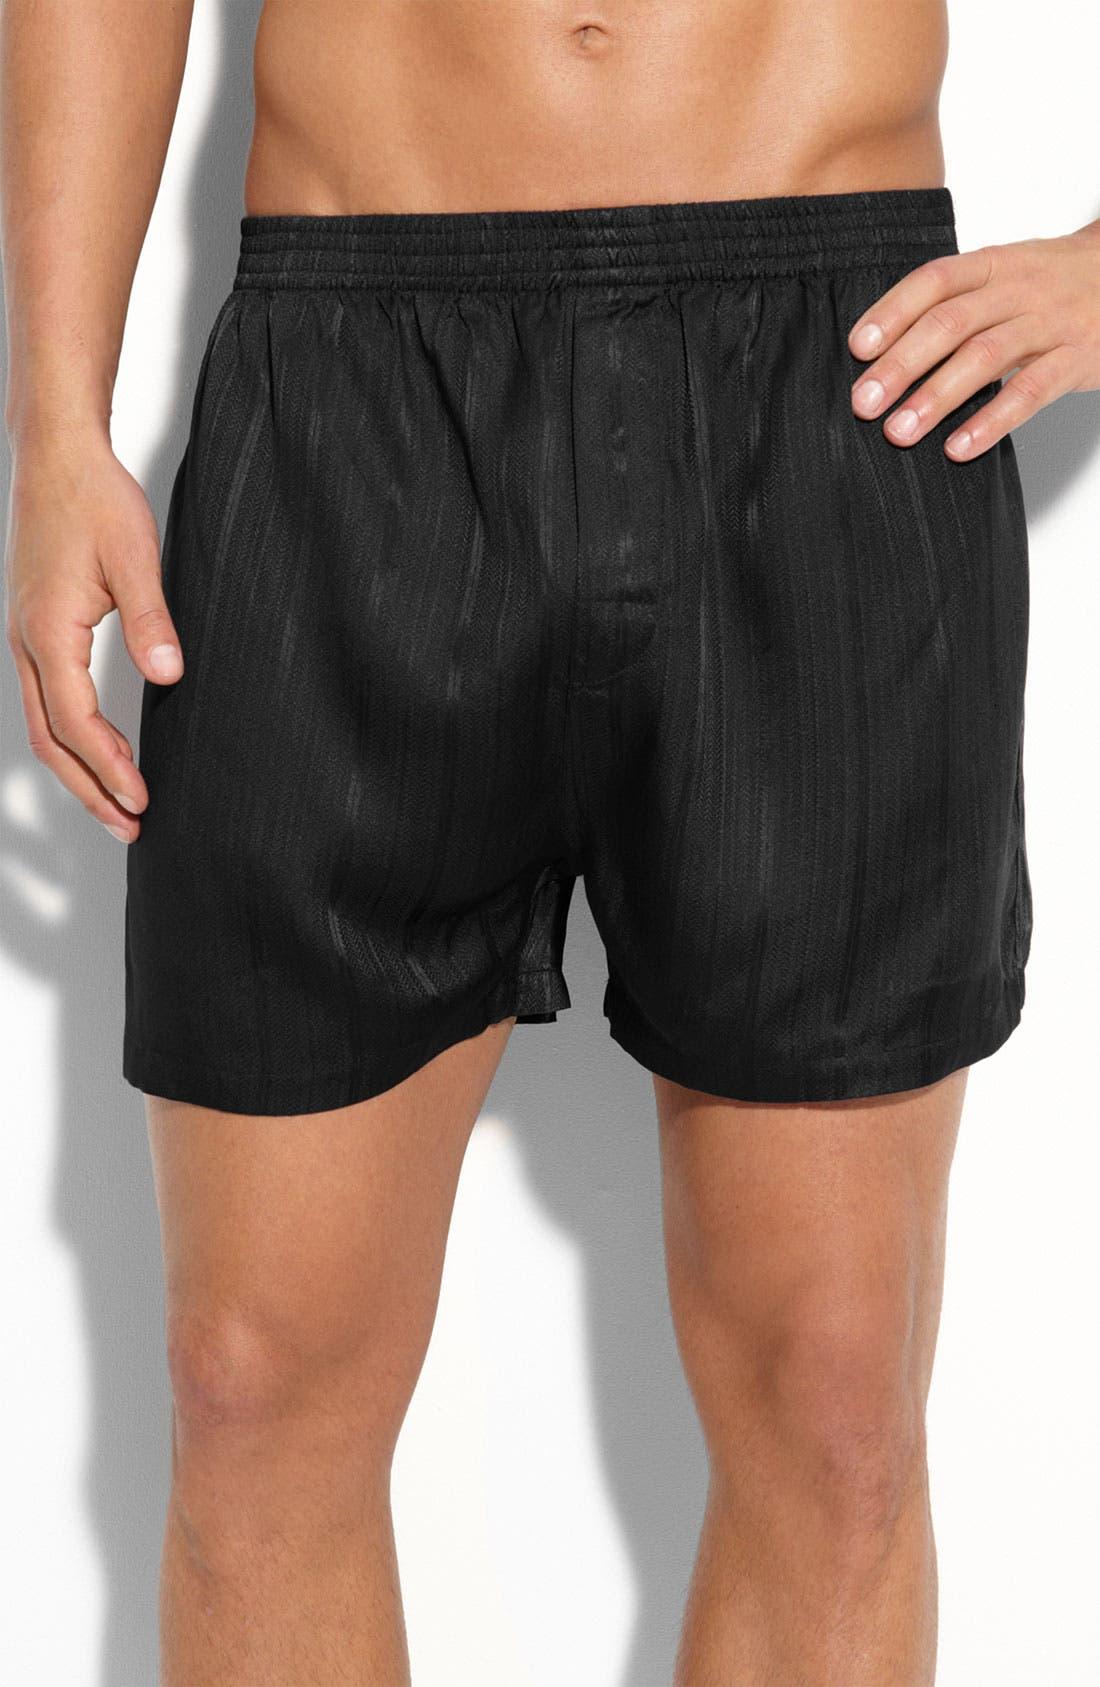 Main Image - Majestic International Herringbone Stripe Silk Boxer Shorts